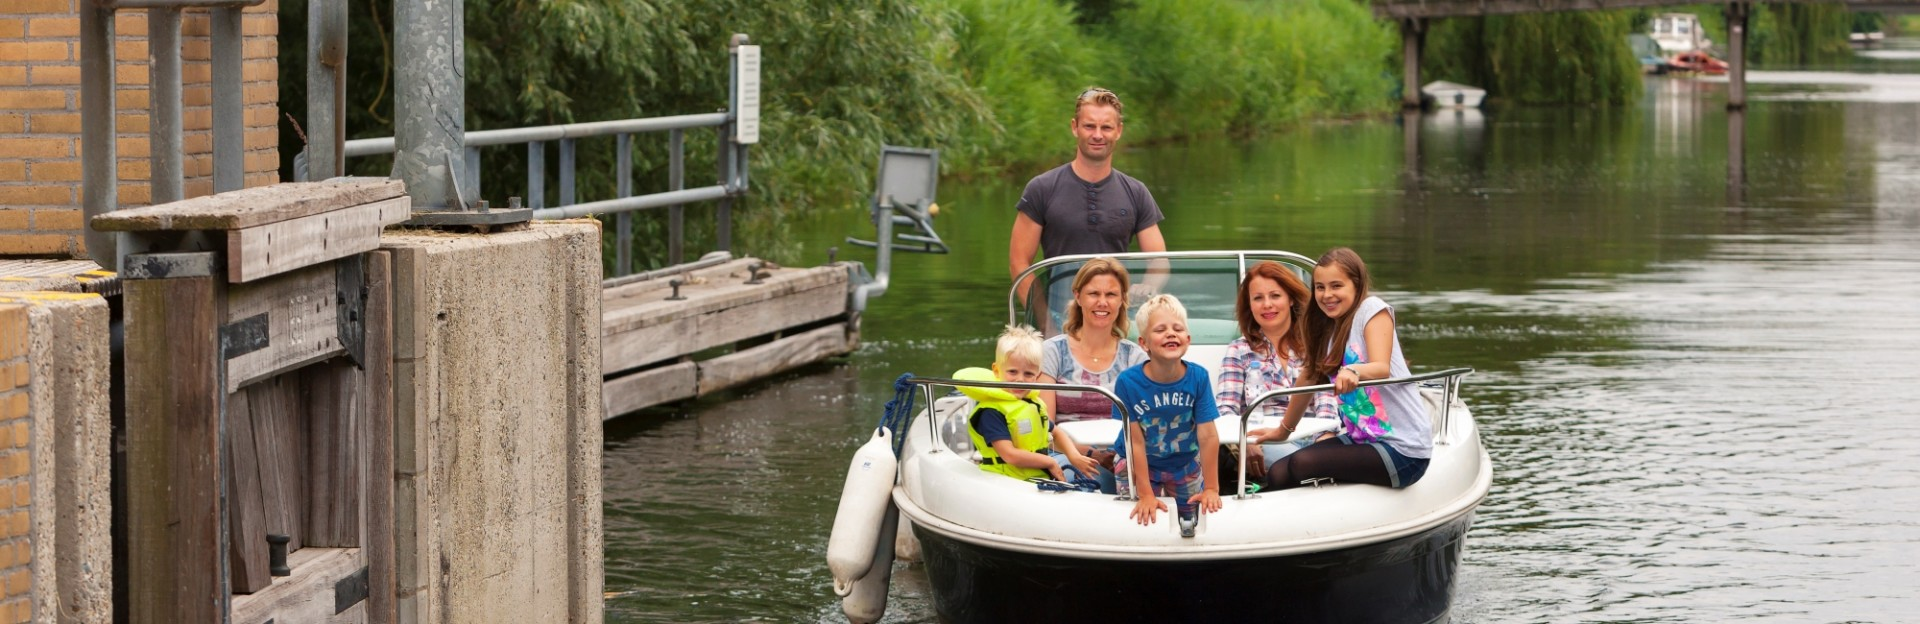 blauwe-as-almere-city-marketing